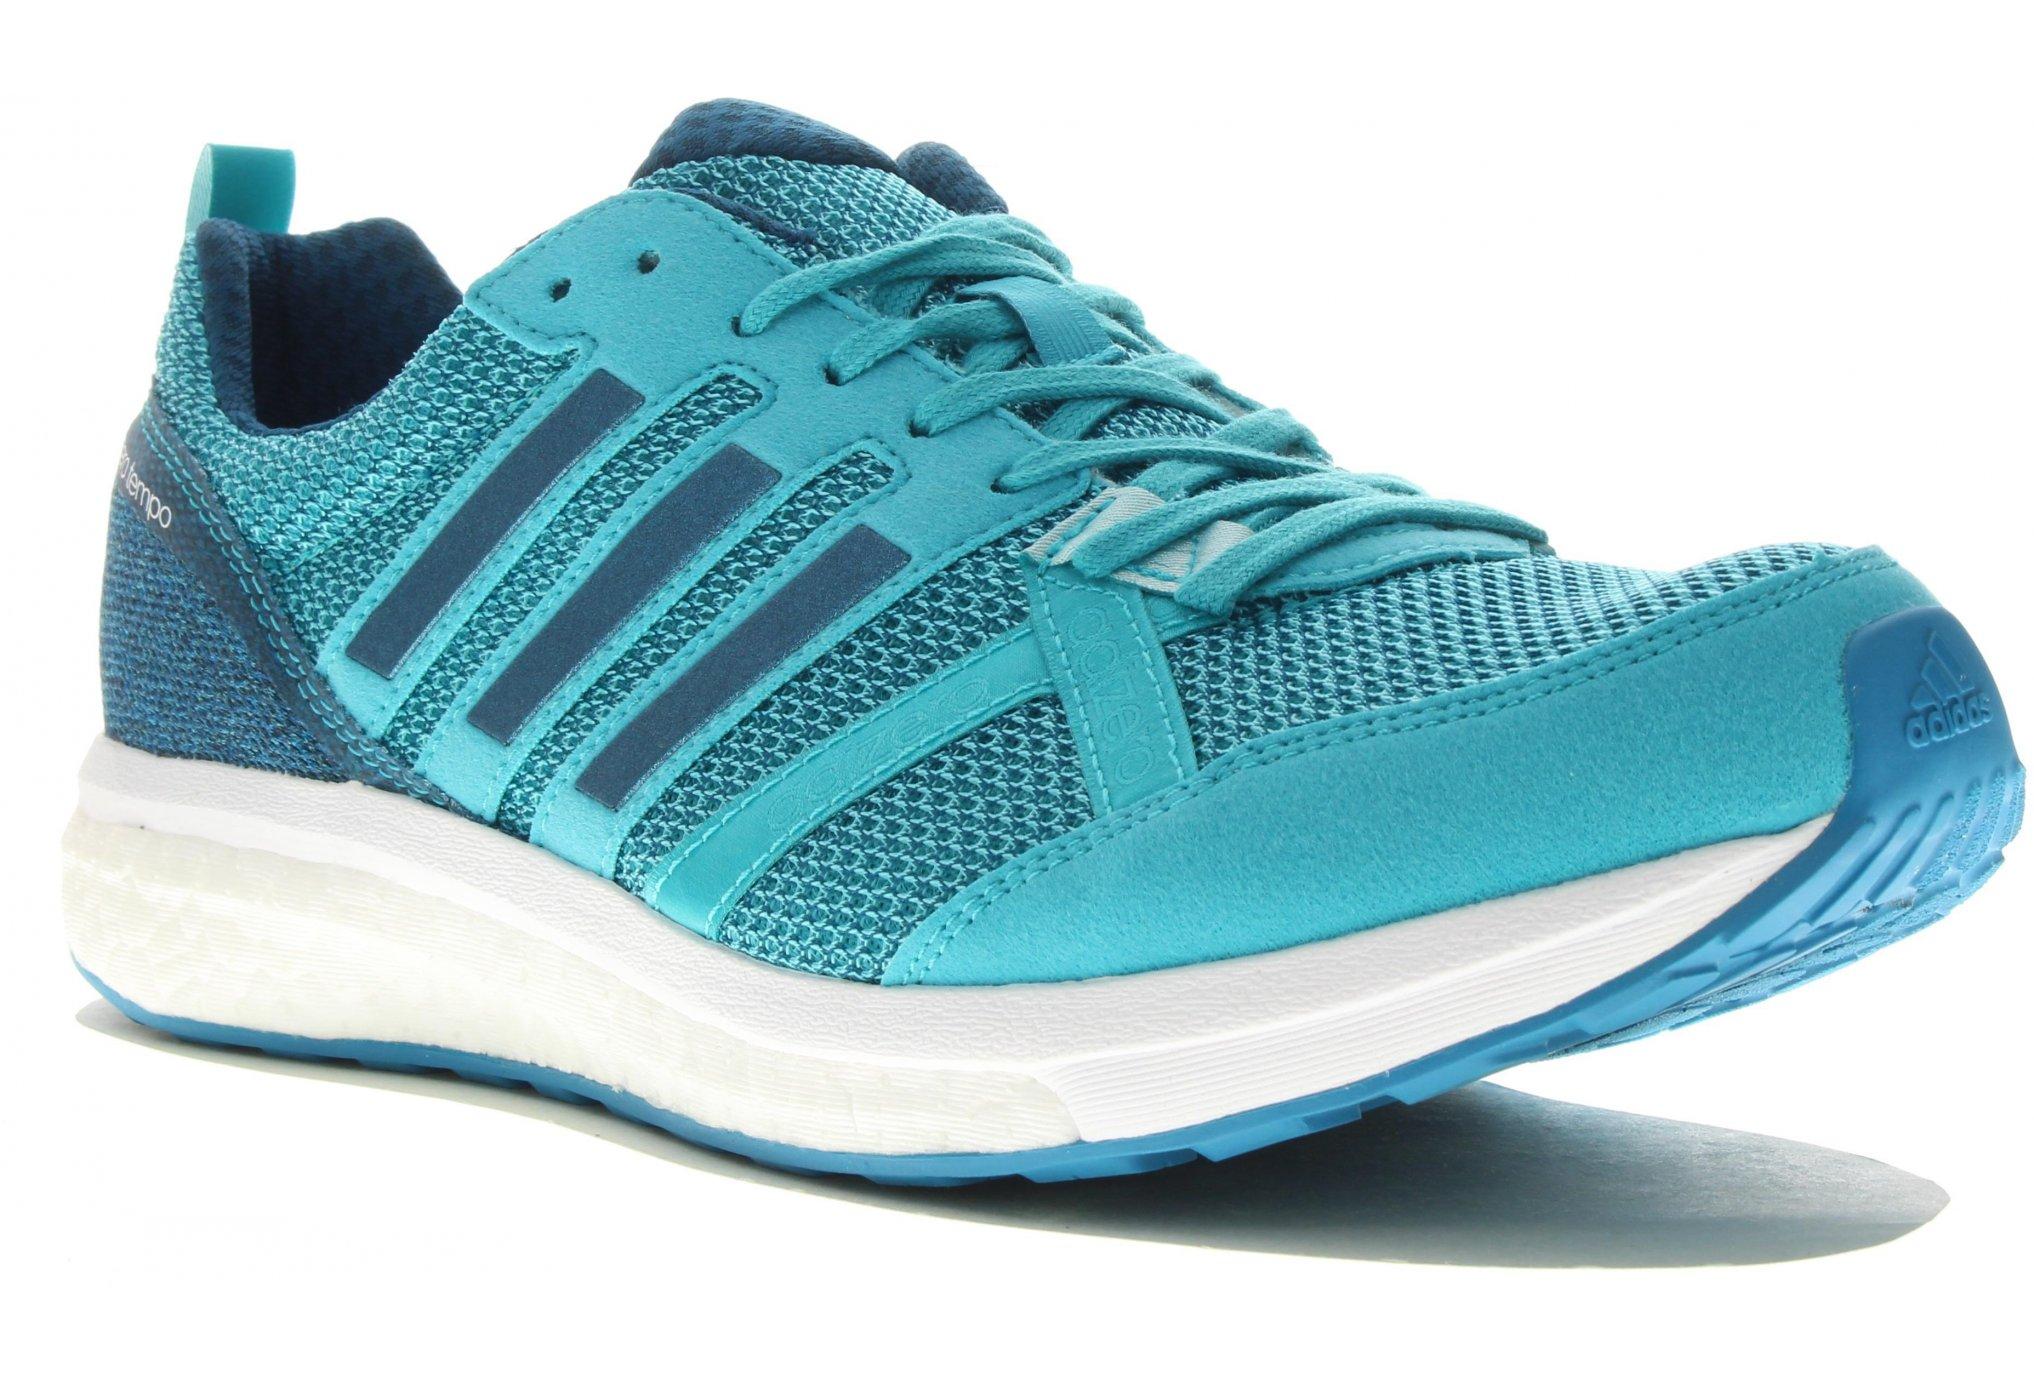 Adidas Adizero tempo 9 m chaussures homme